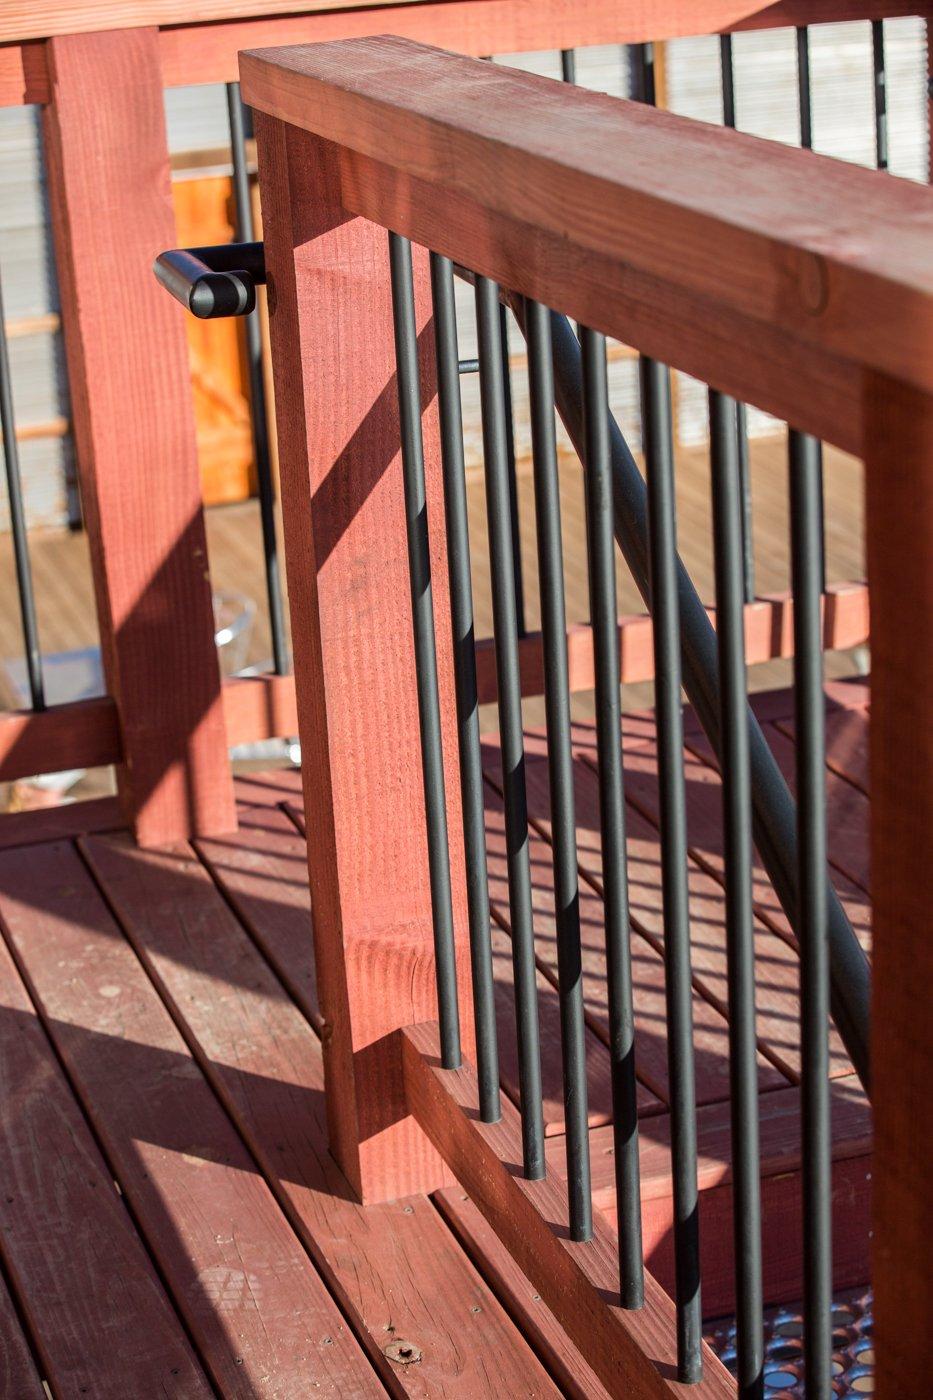 Tully's railing